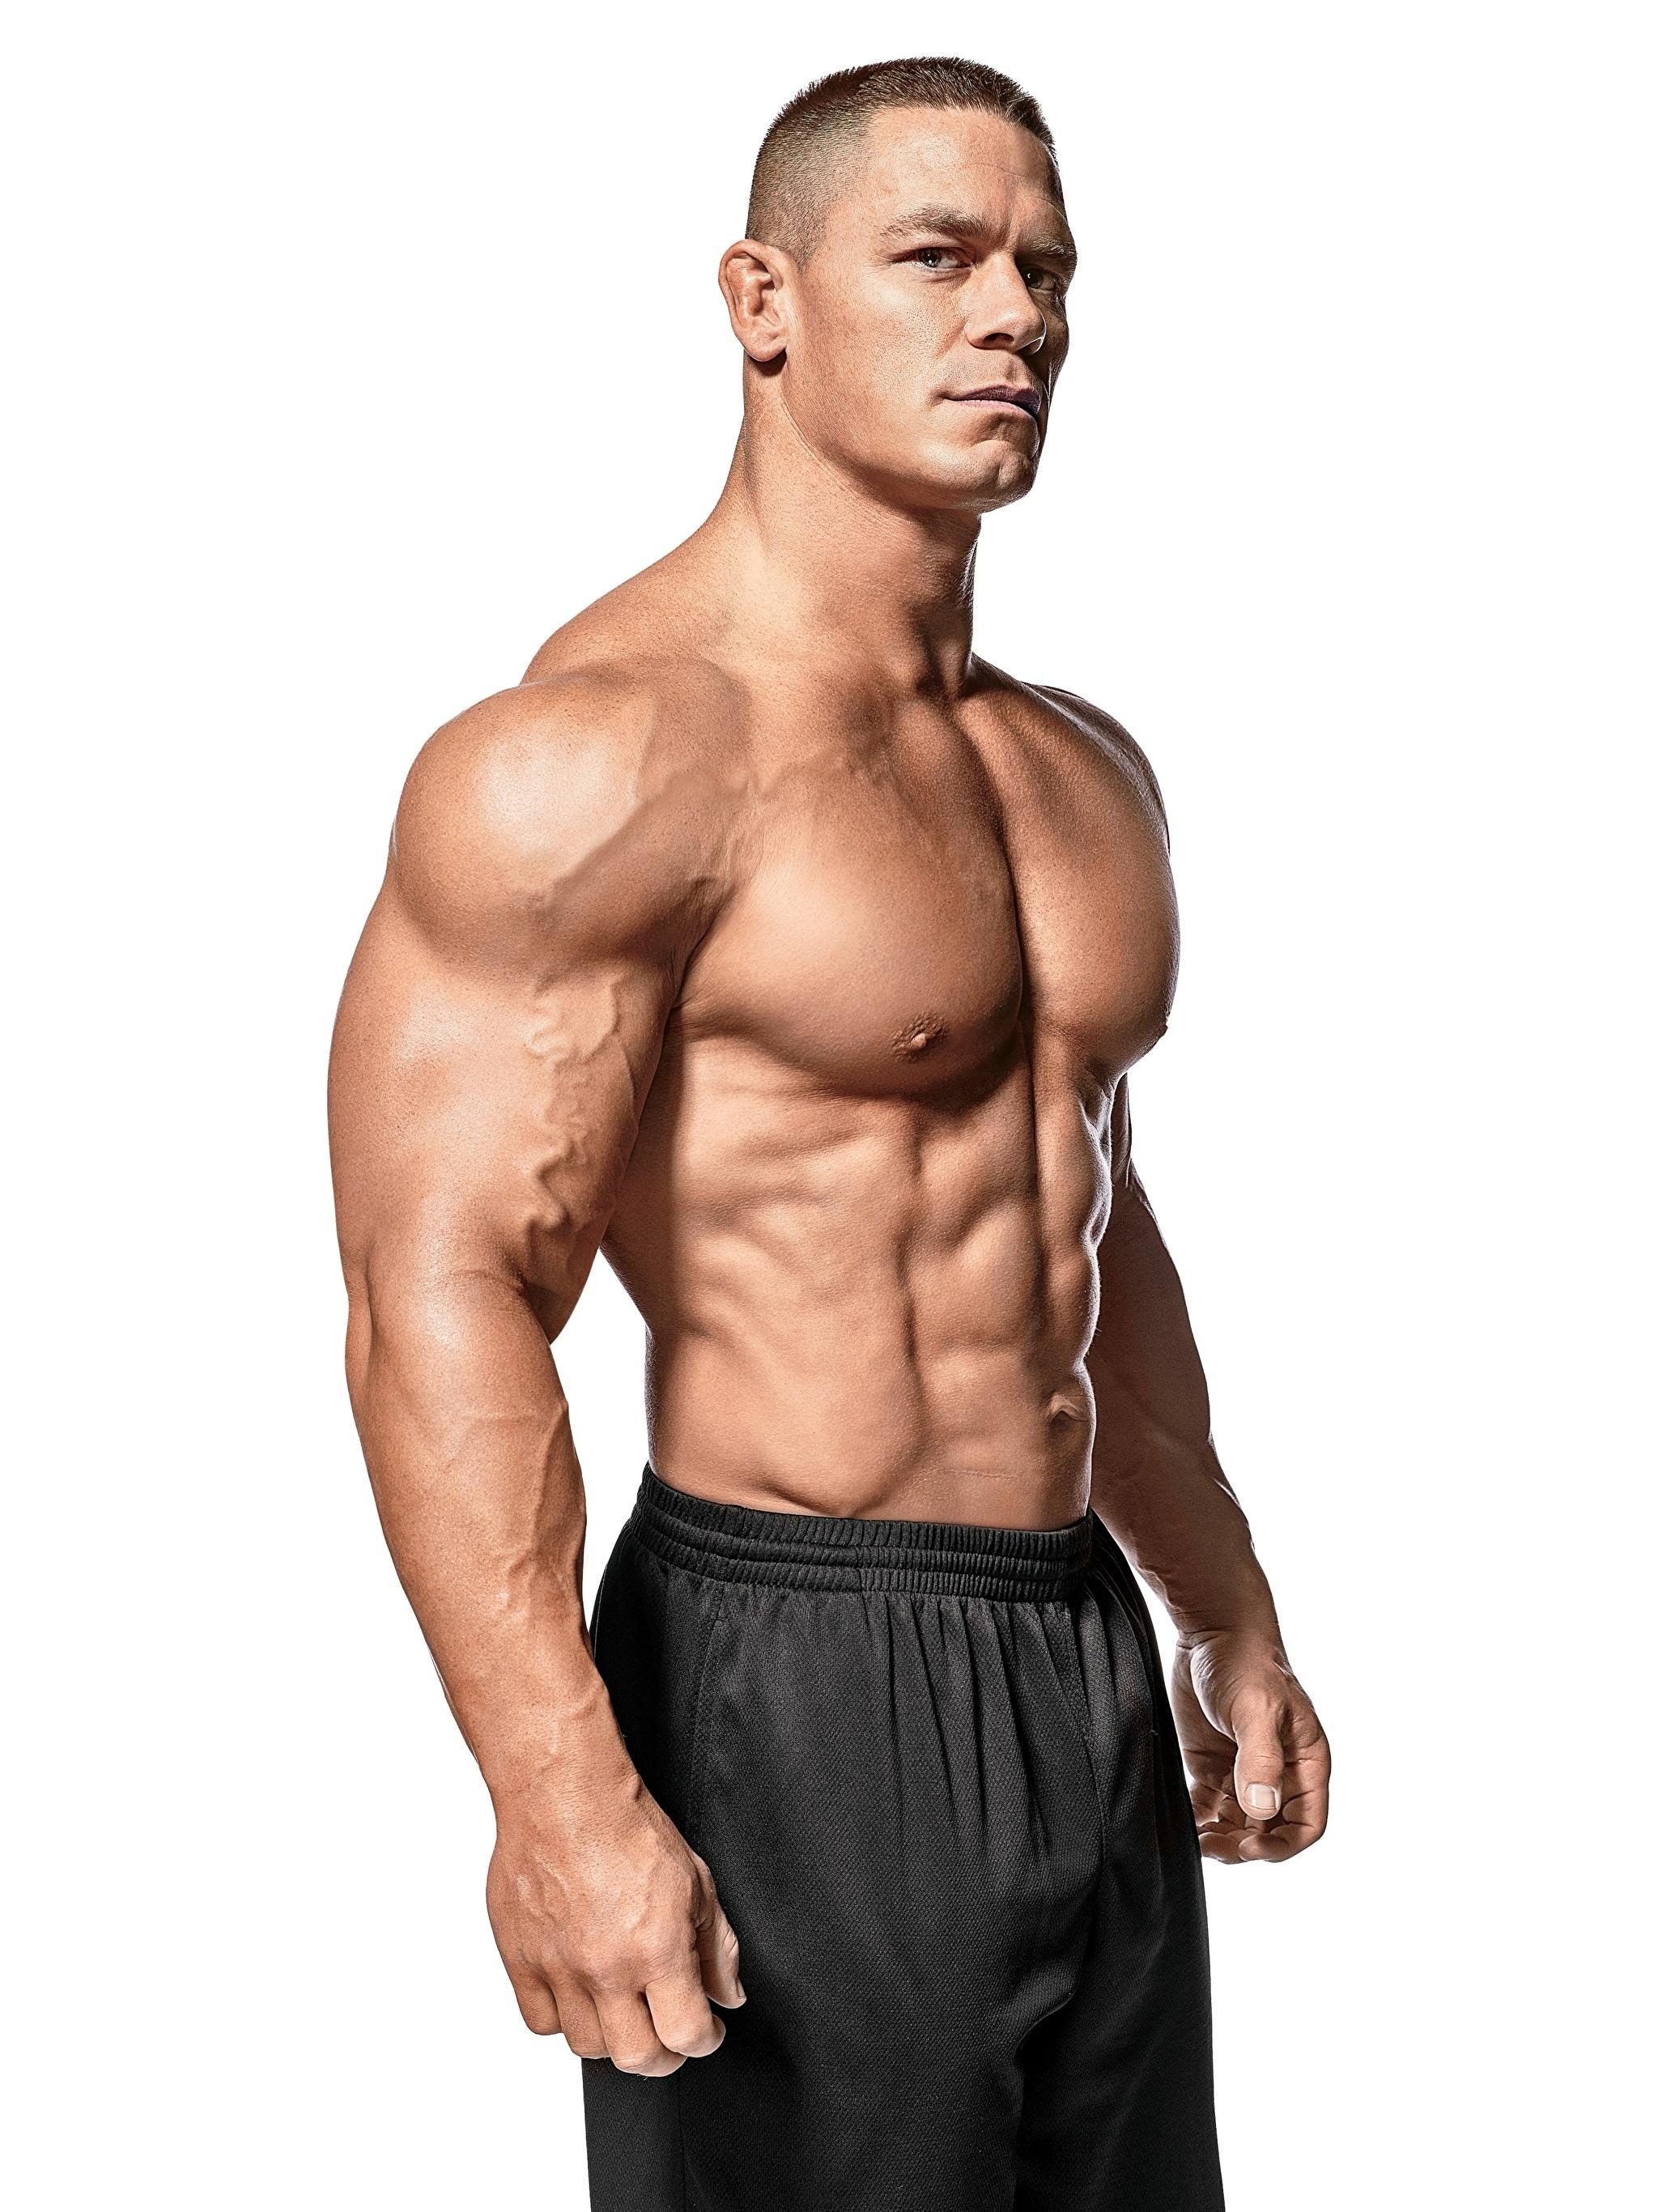 John Cena Gym Wallpaper Hd Download - john cena wallpapers ...